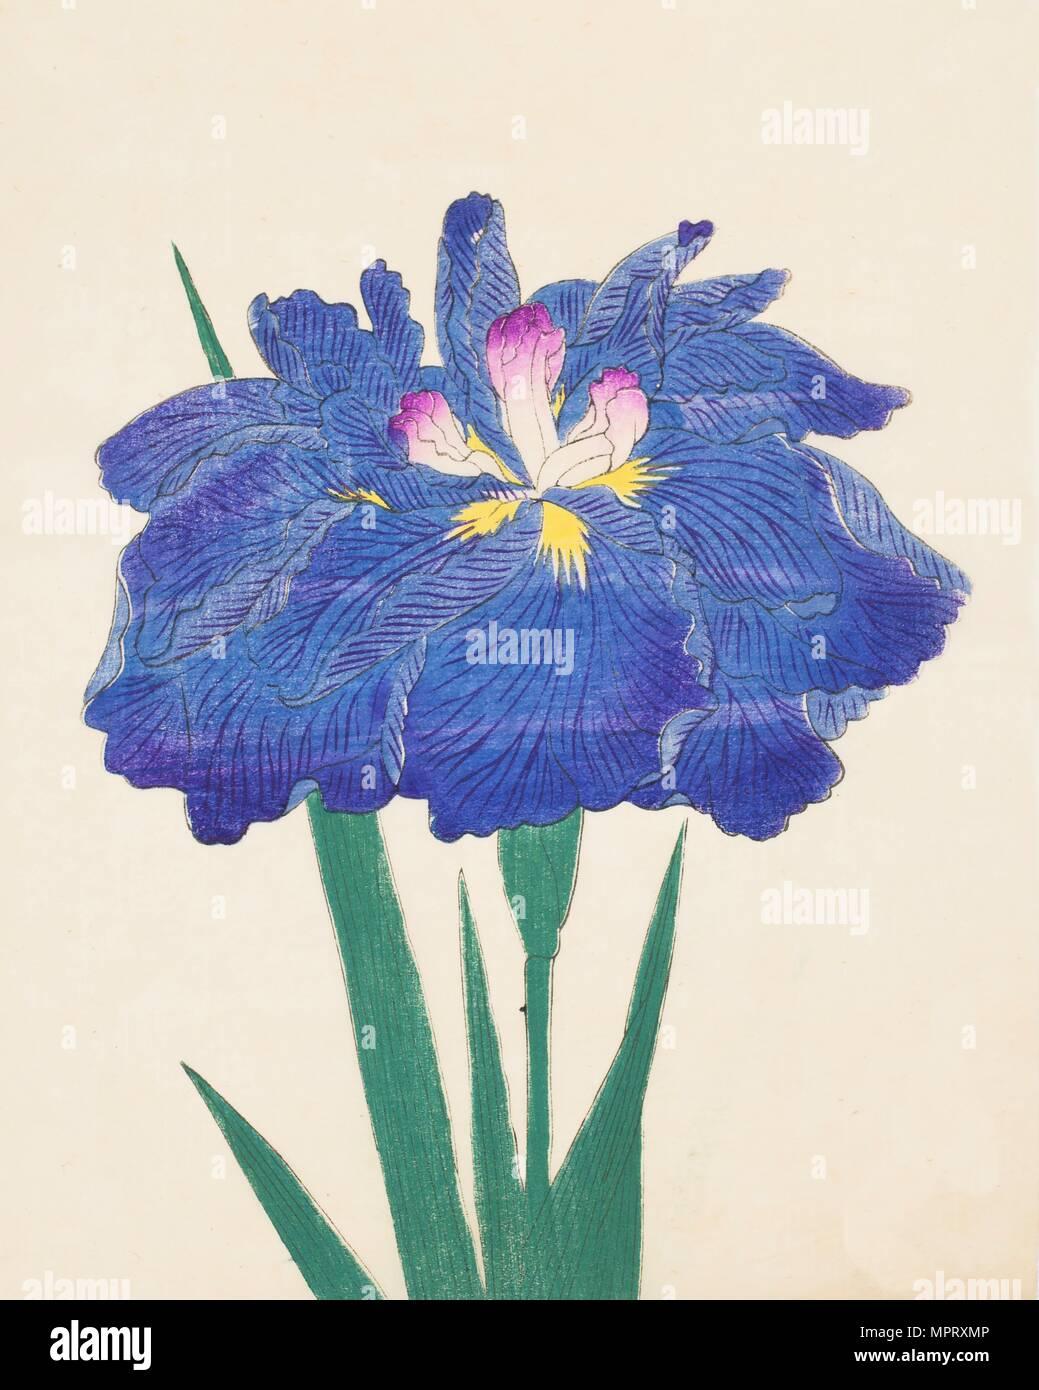 Karako-Asobi, No. 42, 1890, (colour woodblock print) - Stock Image